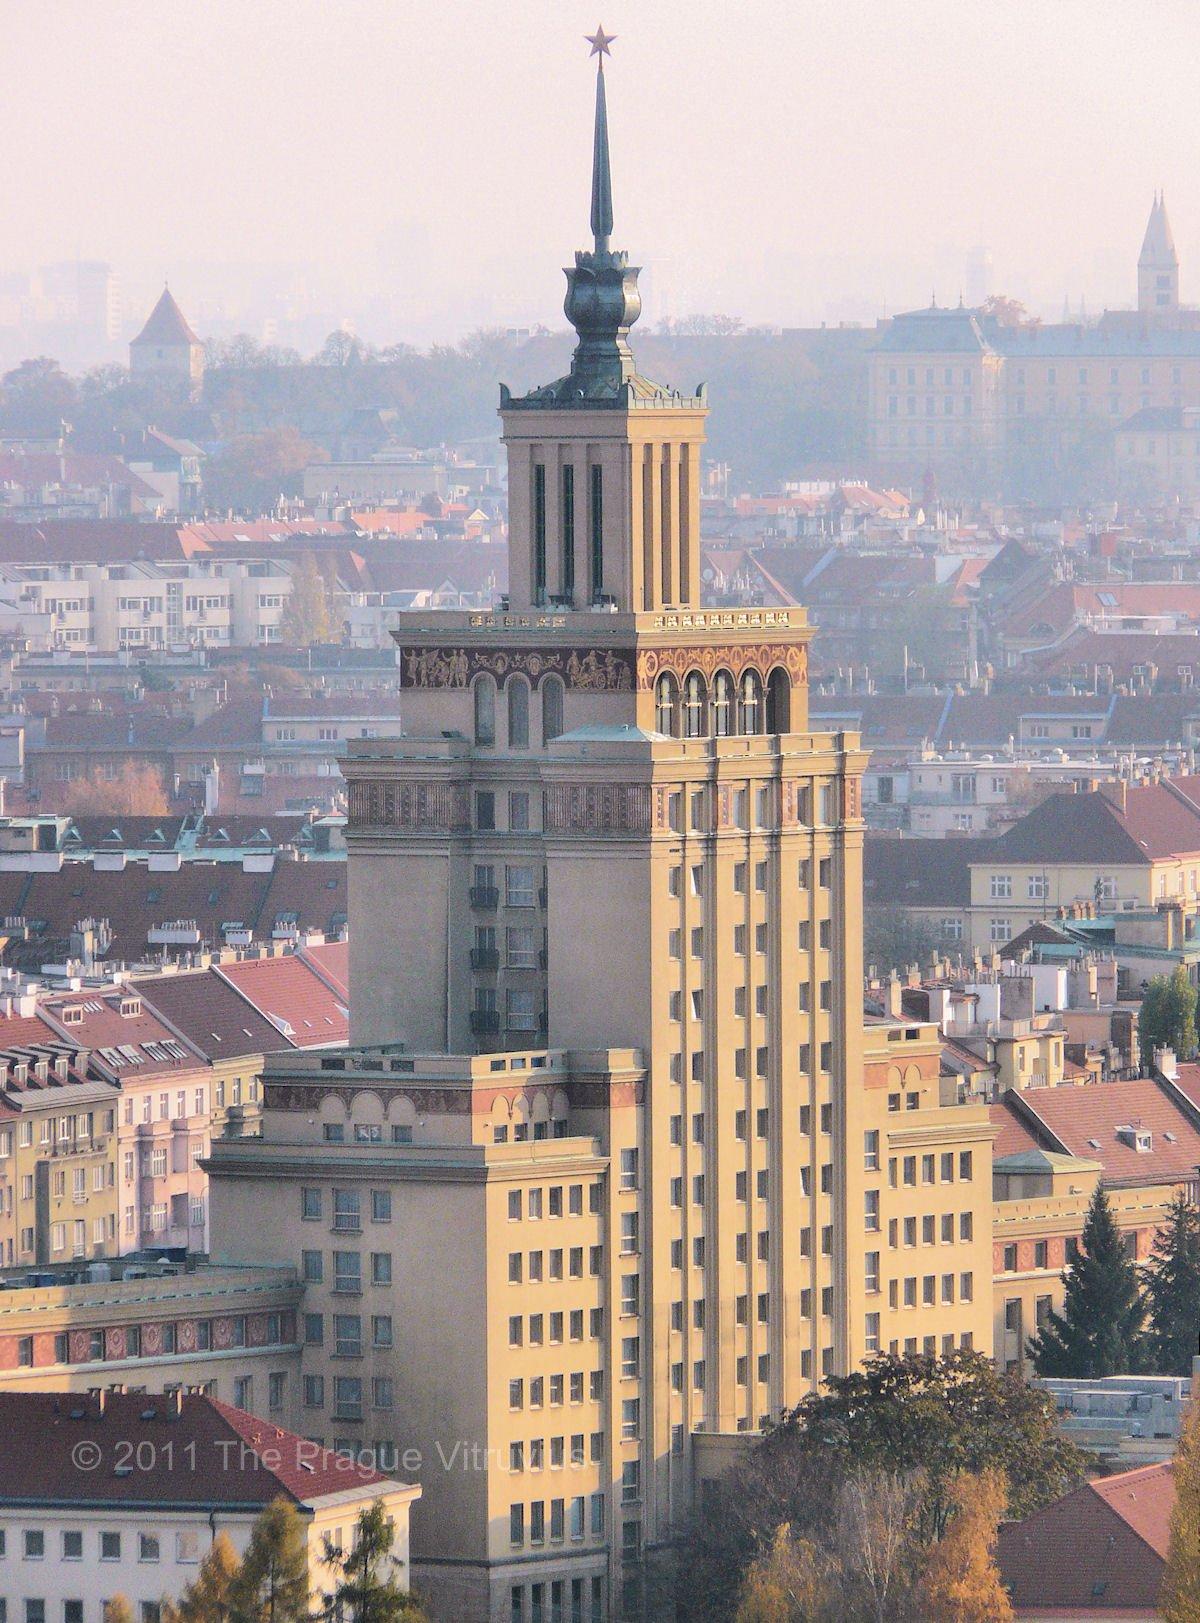 Hotel Crowne Plaza in Prague